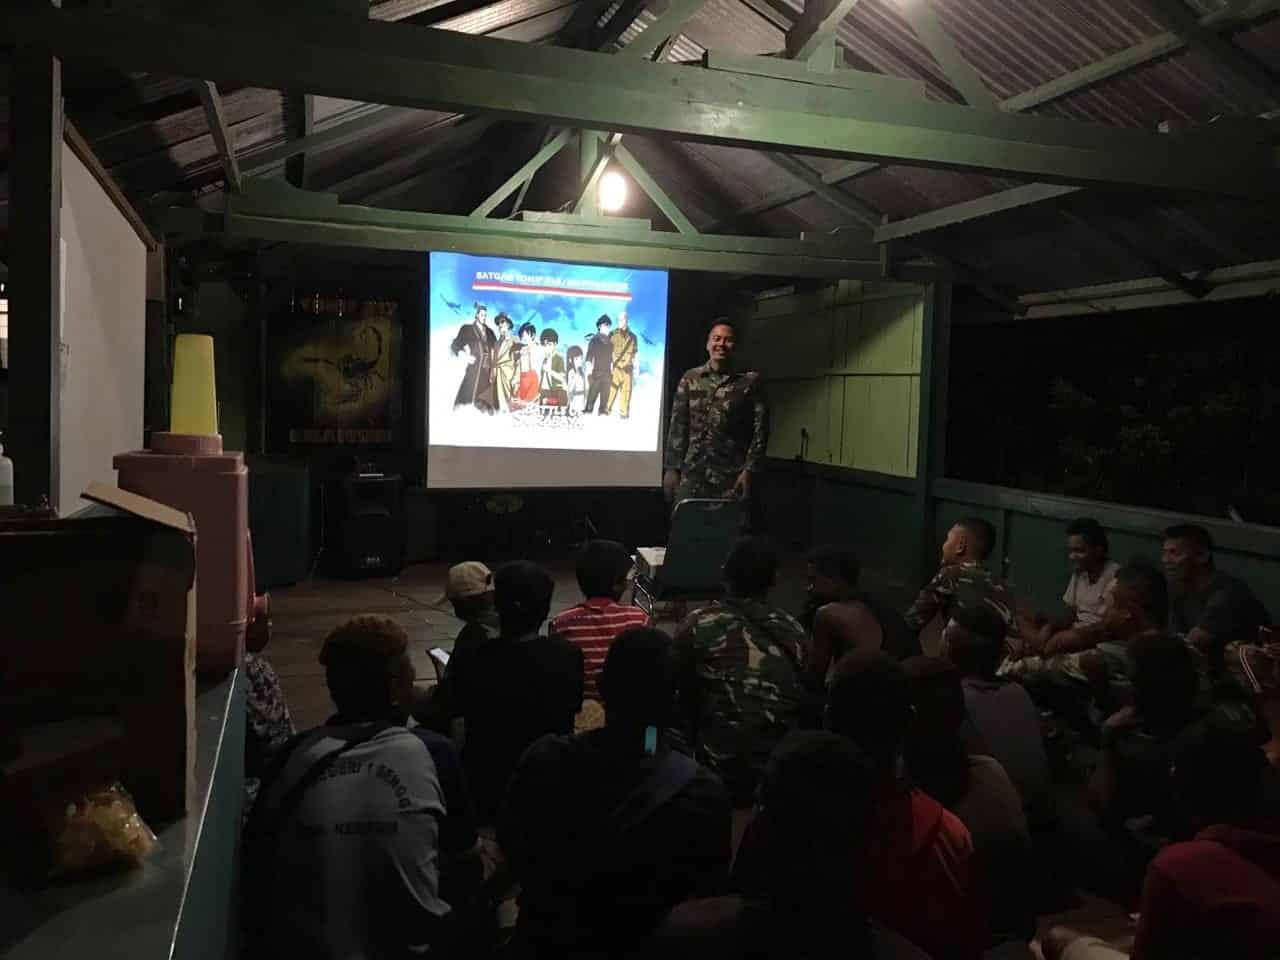 Maknai Hari Pahlawan, Satgas Yonif 312 Bersama Anak Perbatasan Nobar Film The Battle of Surabaya